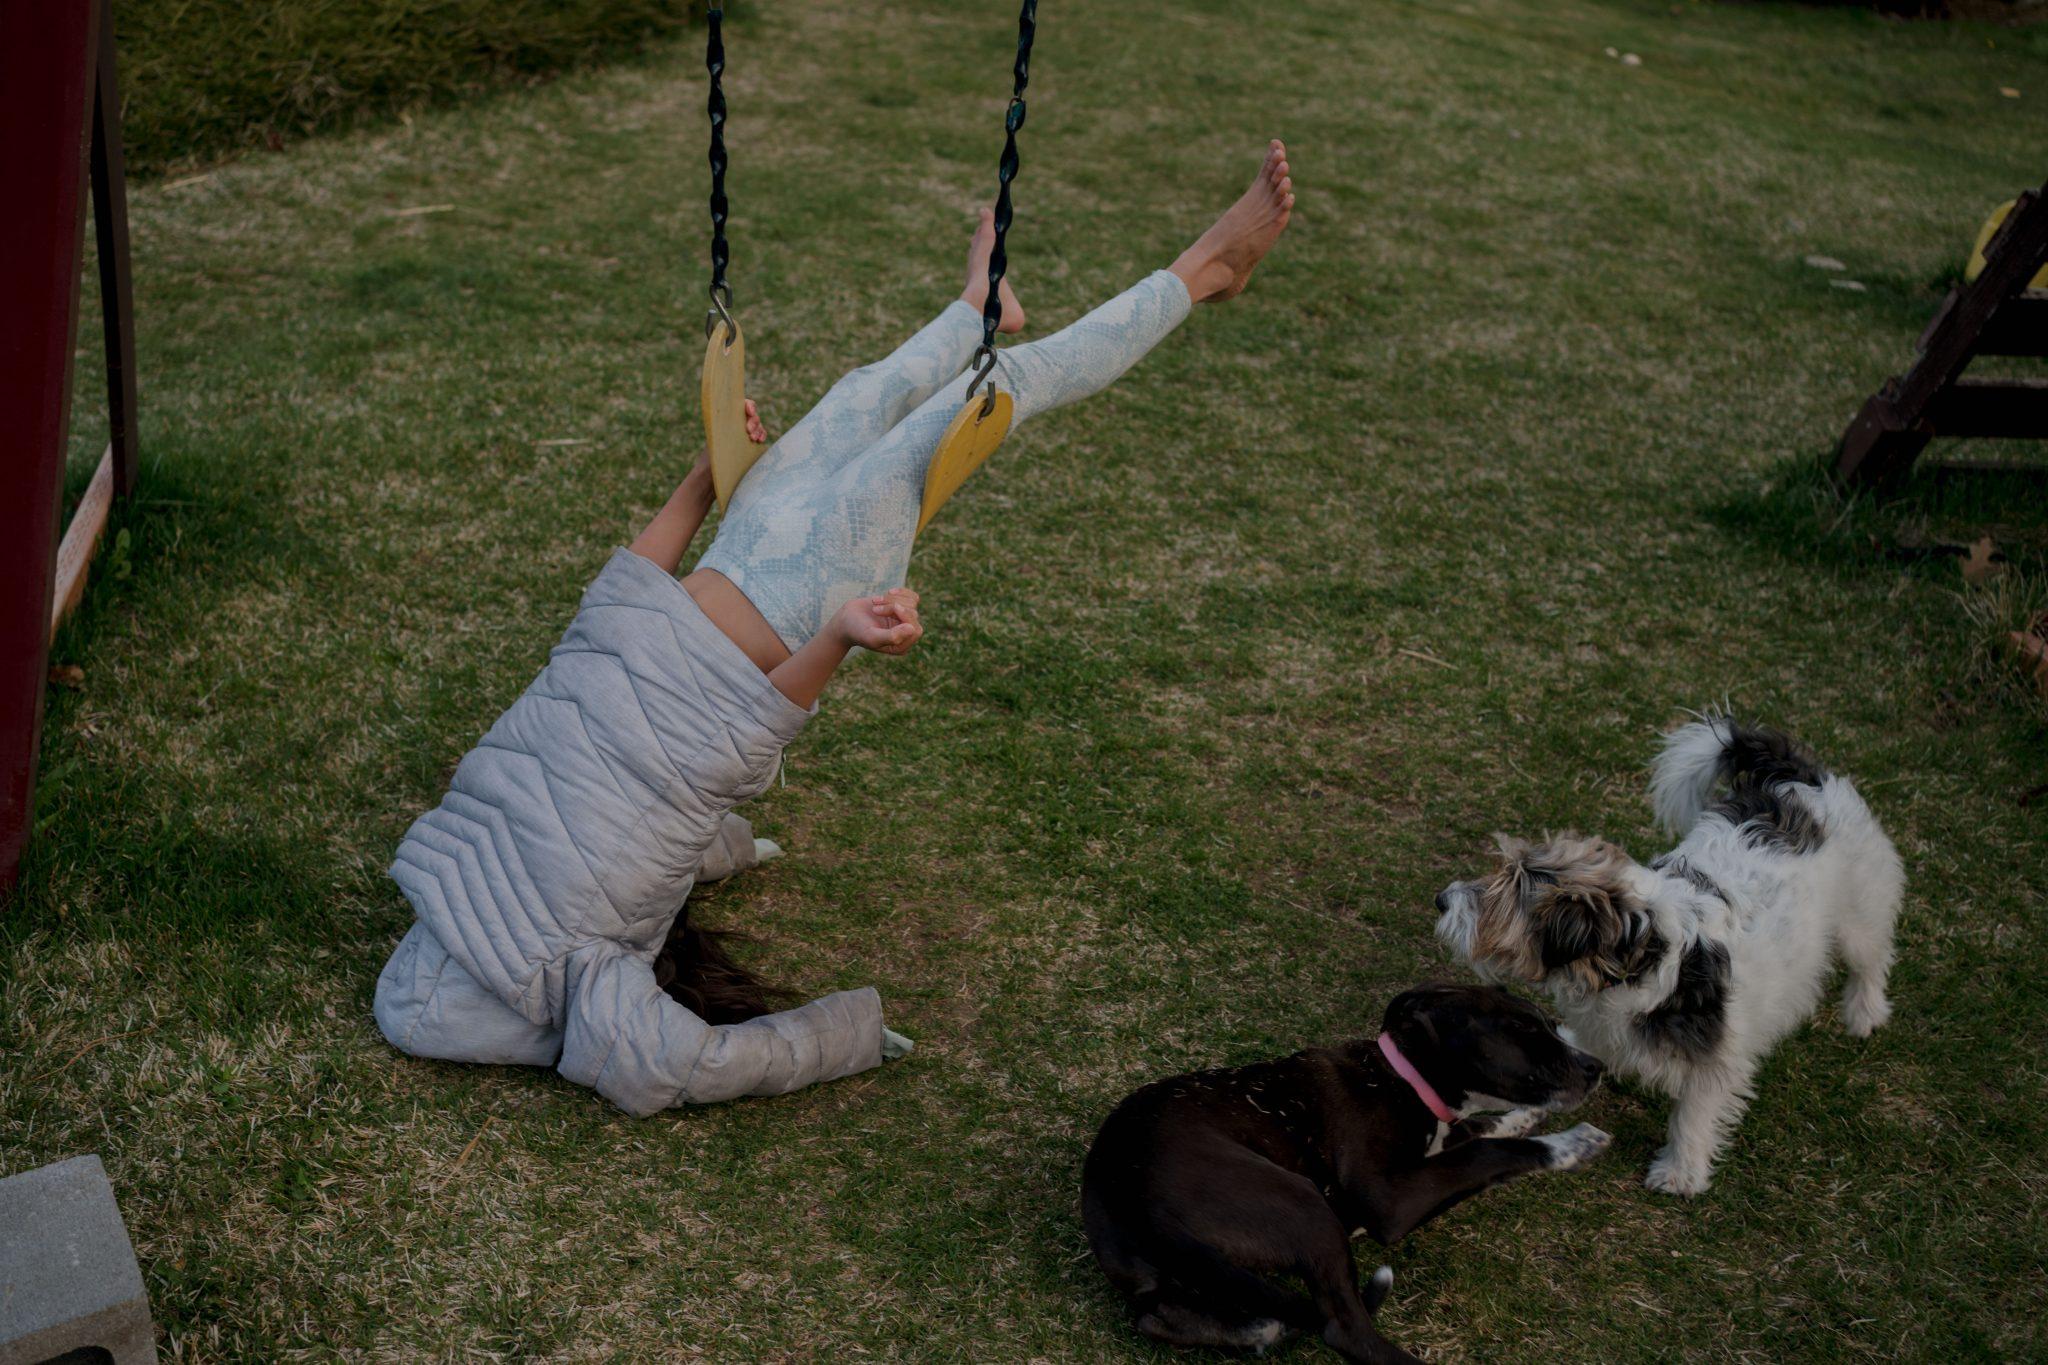 kid stuck on swing dogs watching